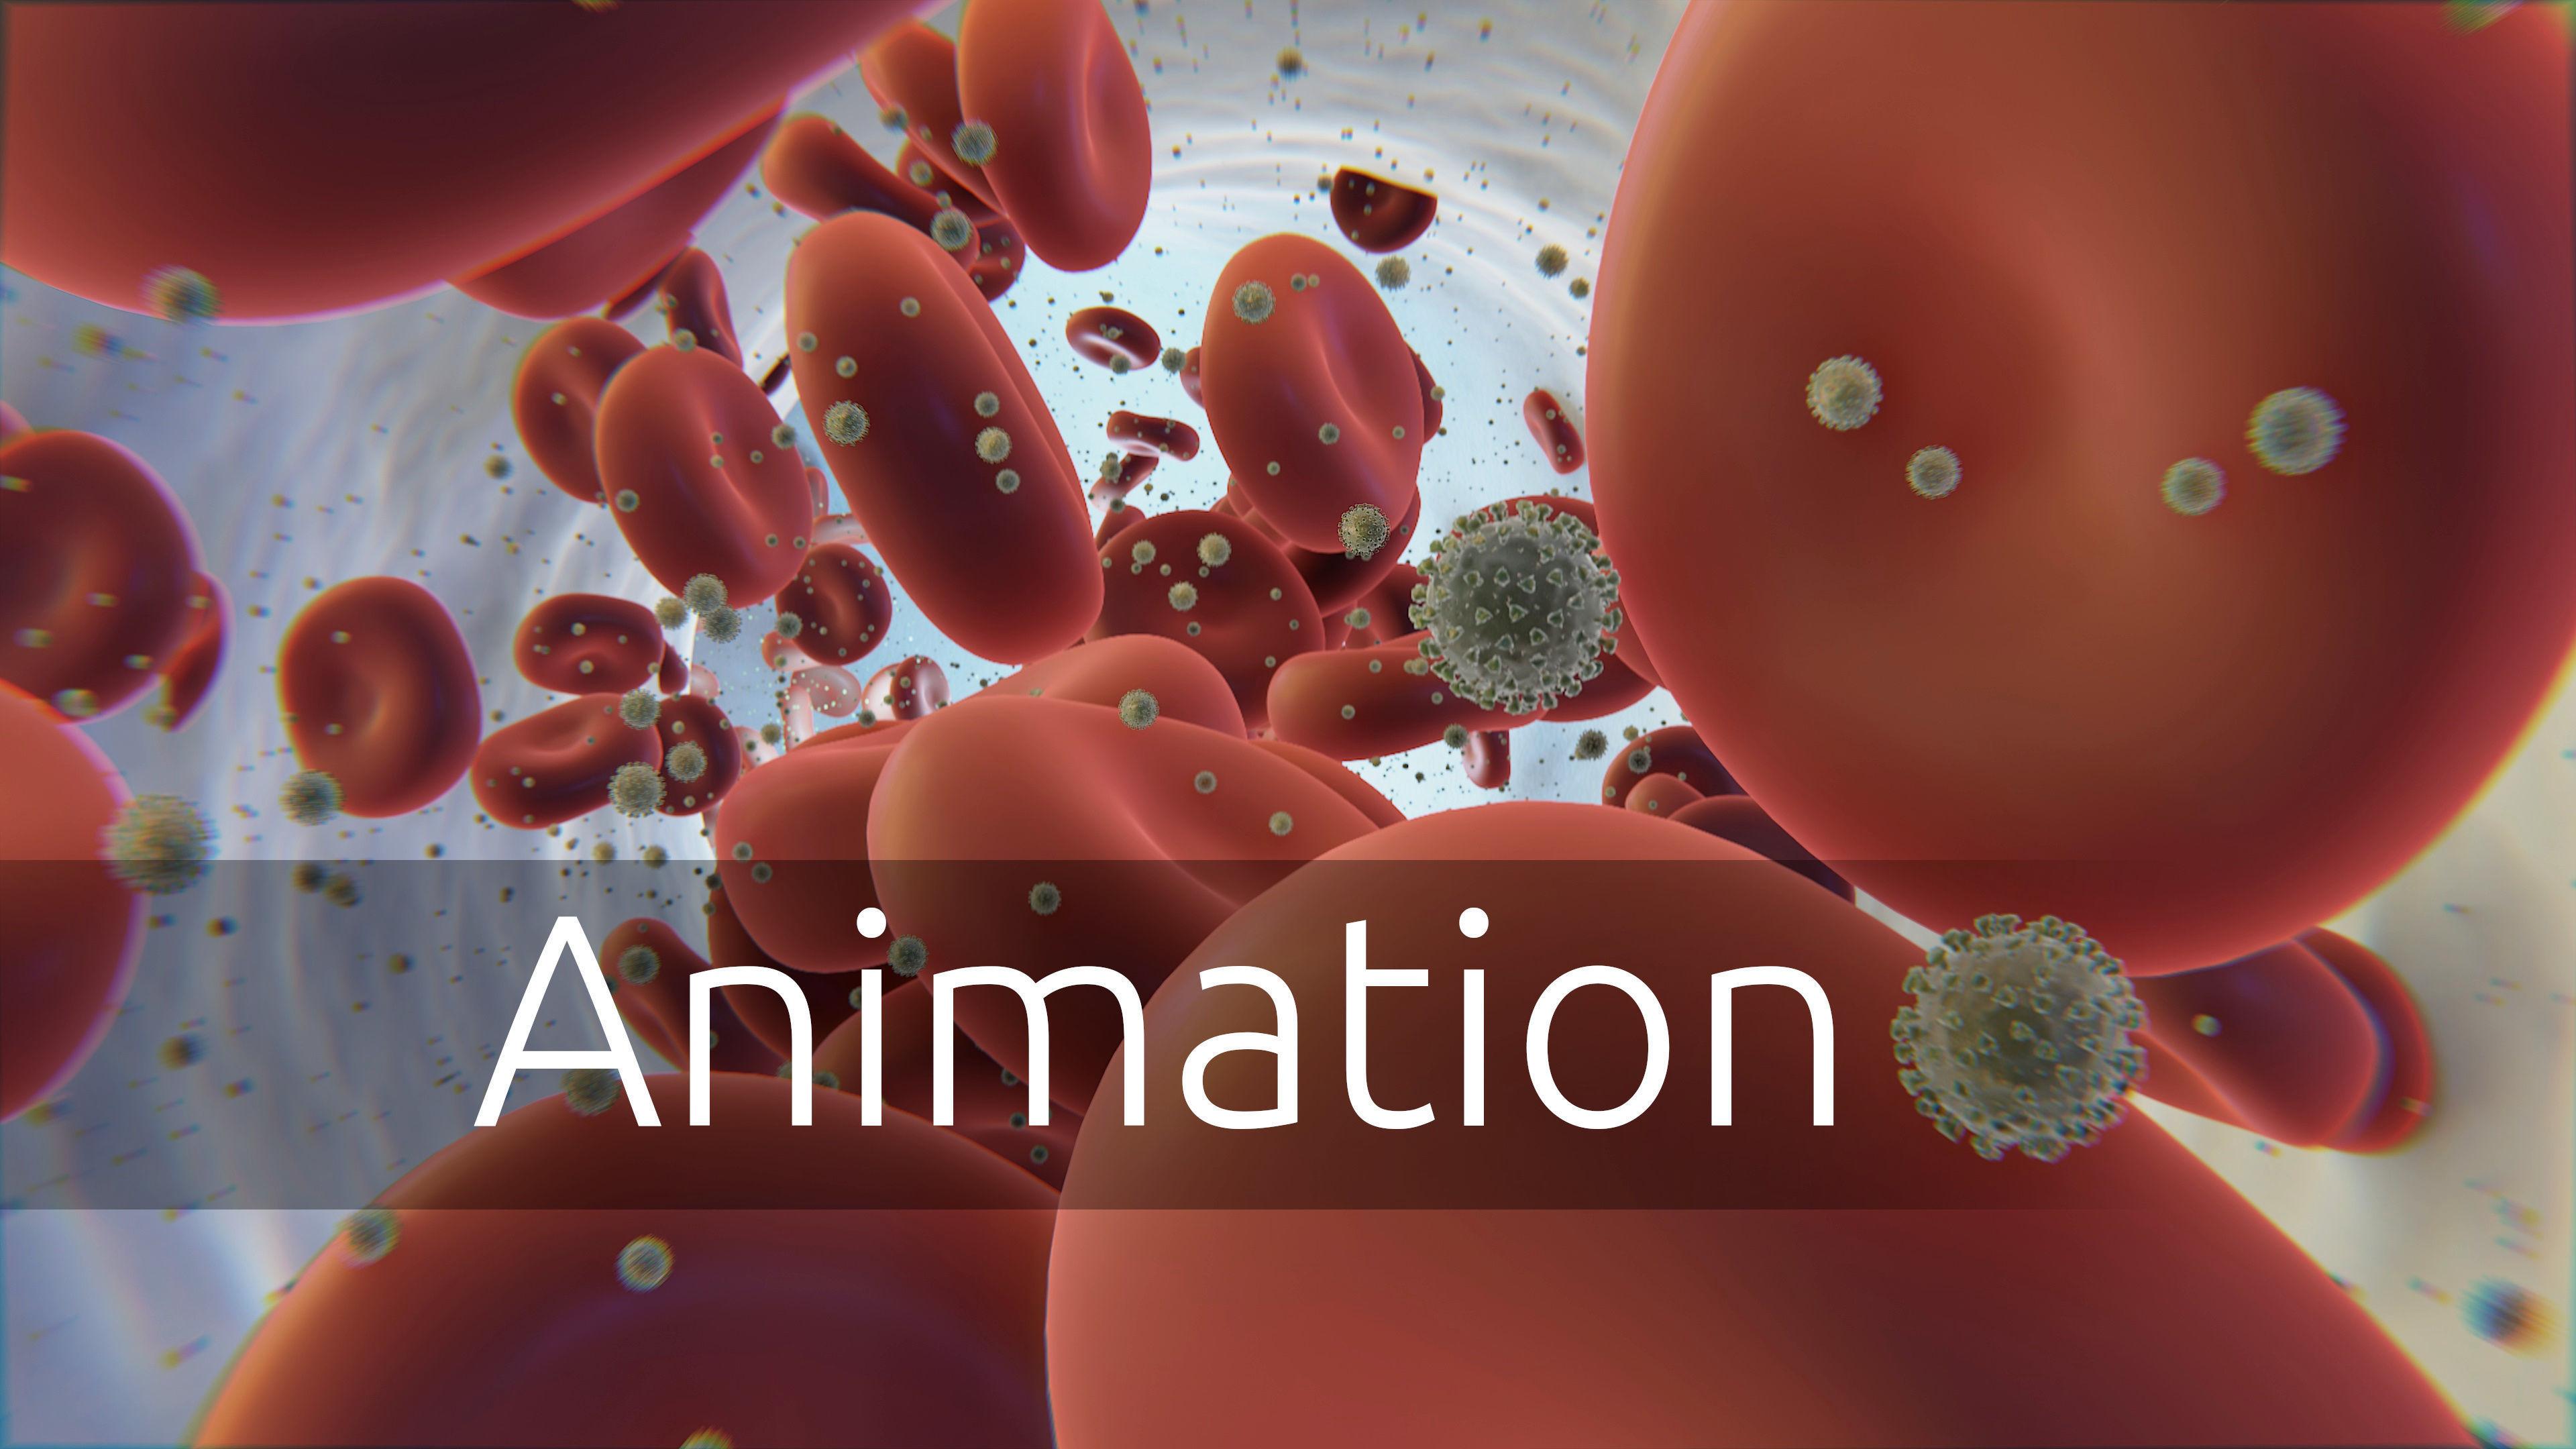 coronavirus - animated - blood flow